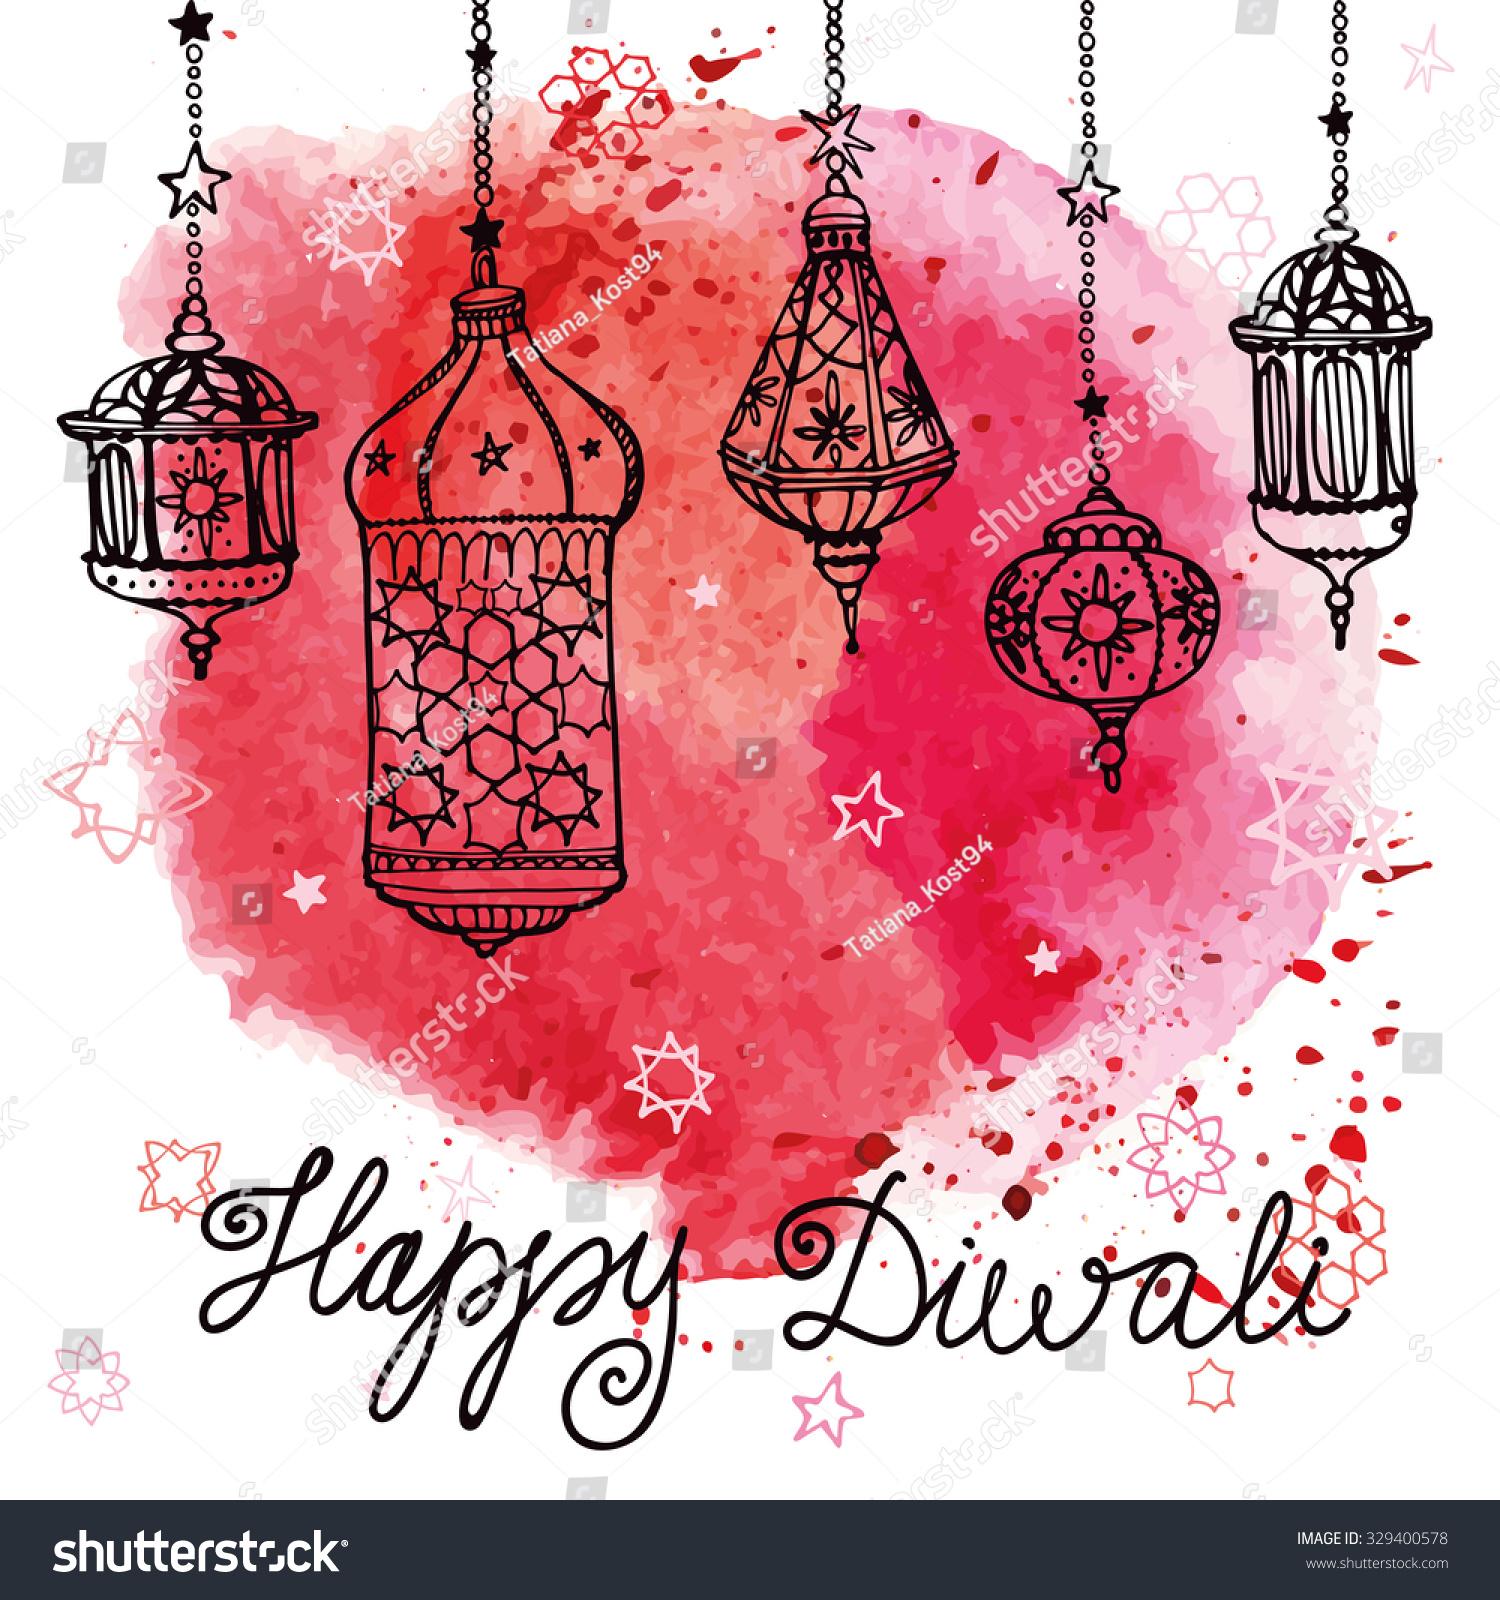 Simple Images Of Diyas Diwali Greetings Cards